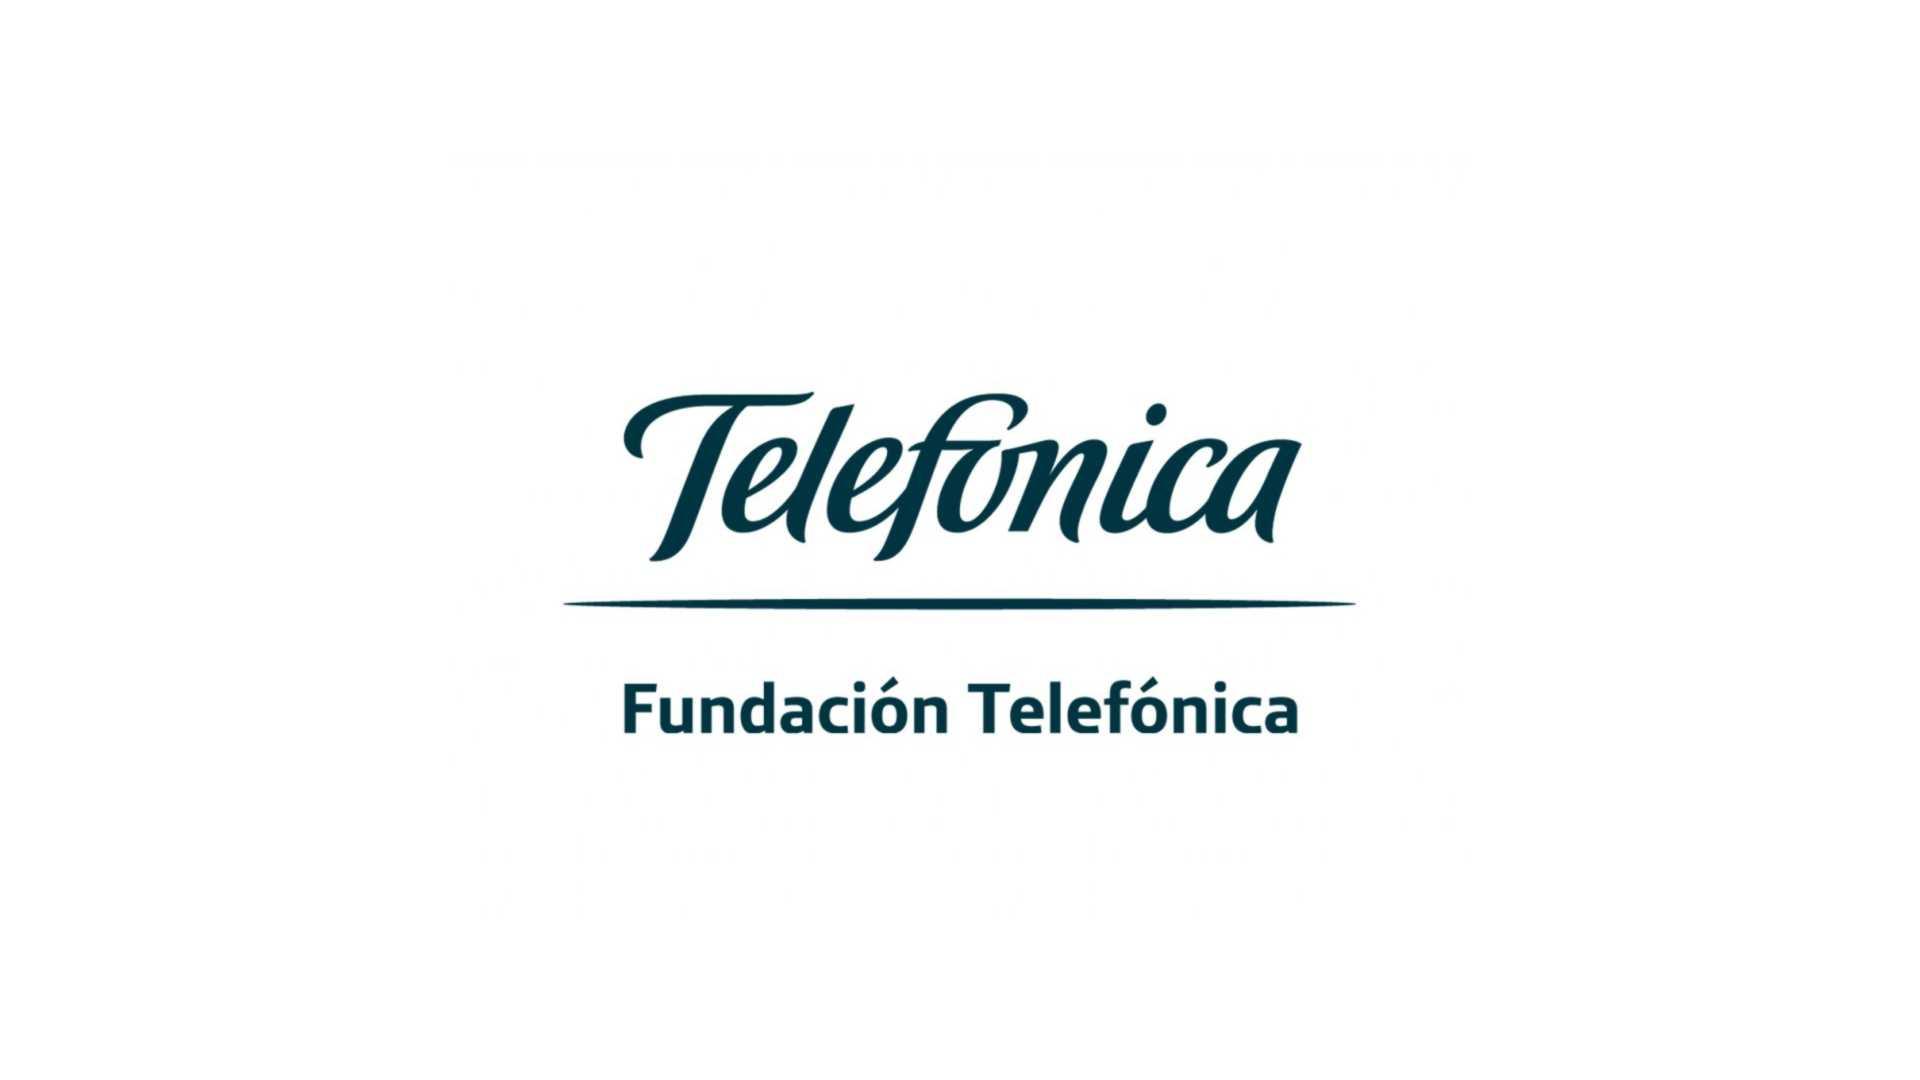 fundacion-telefonica